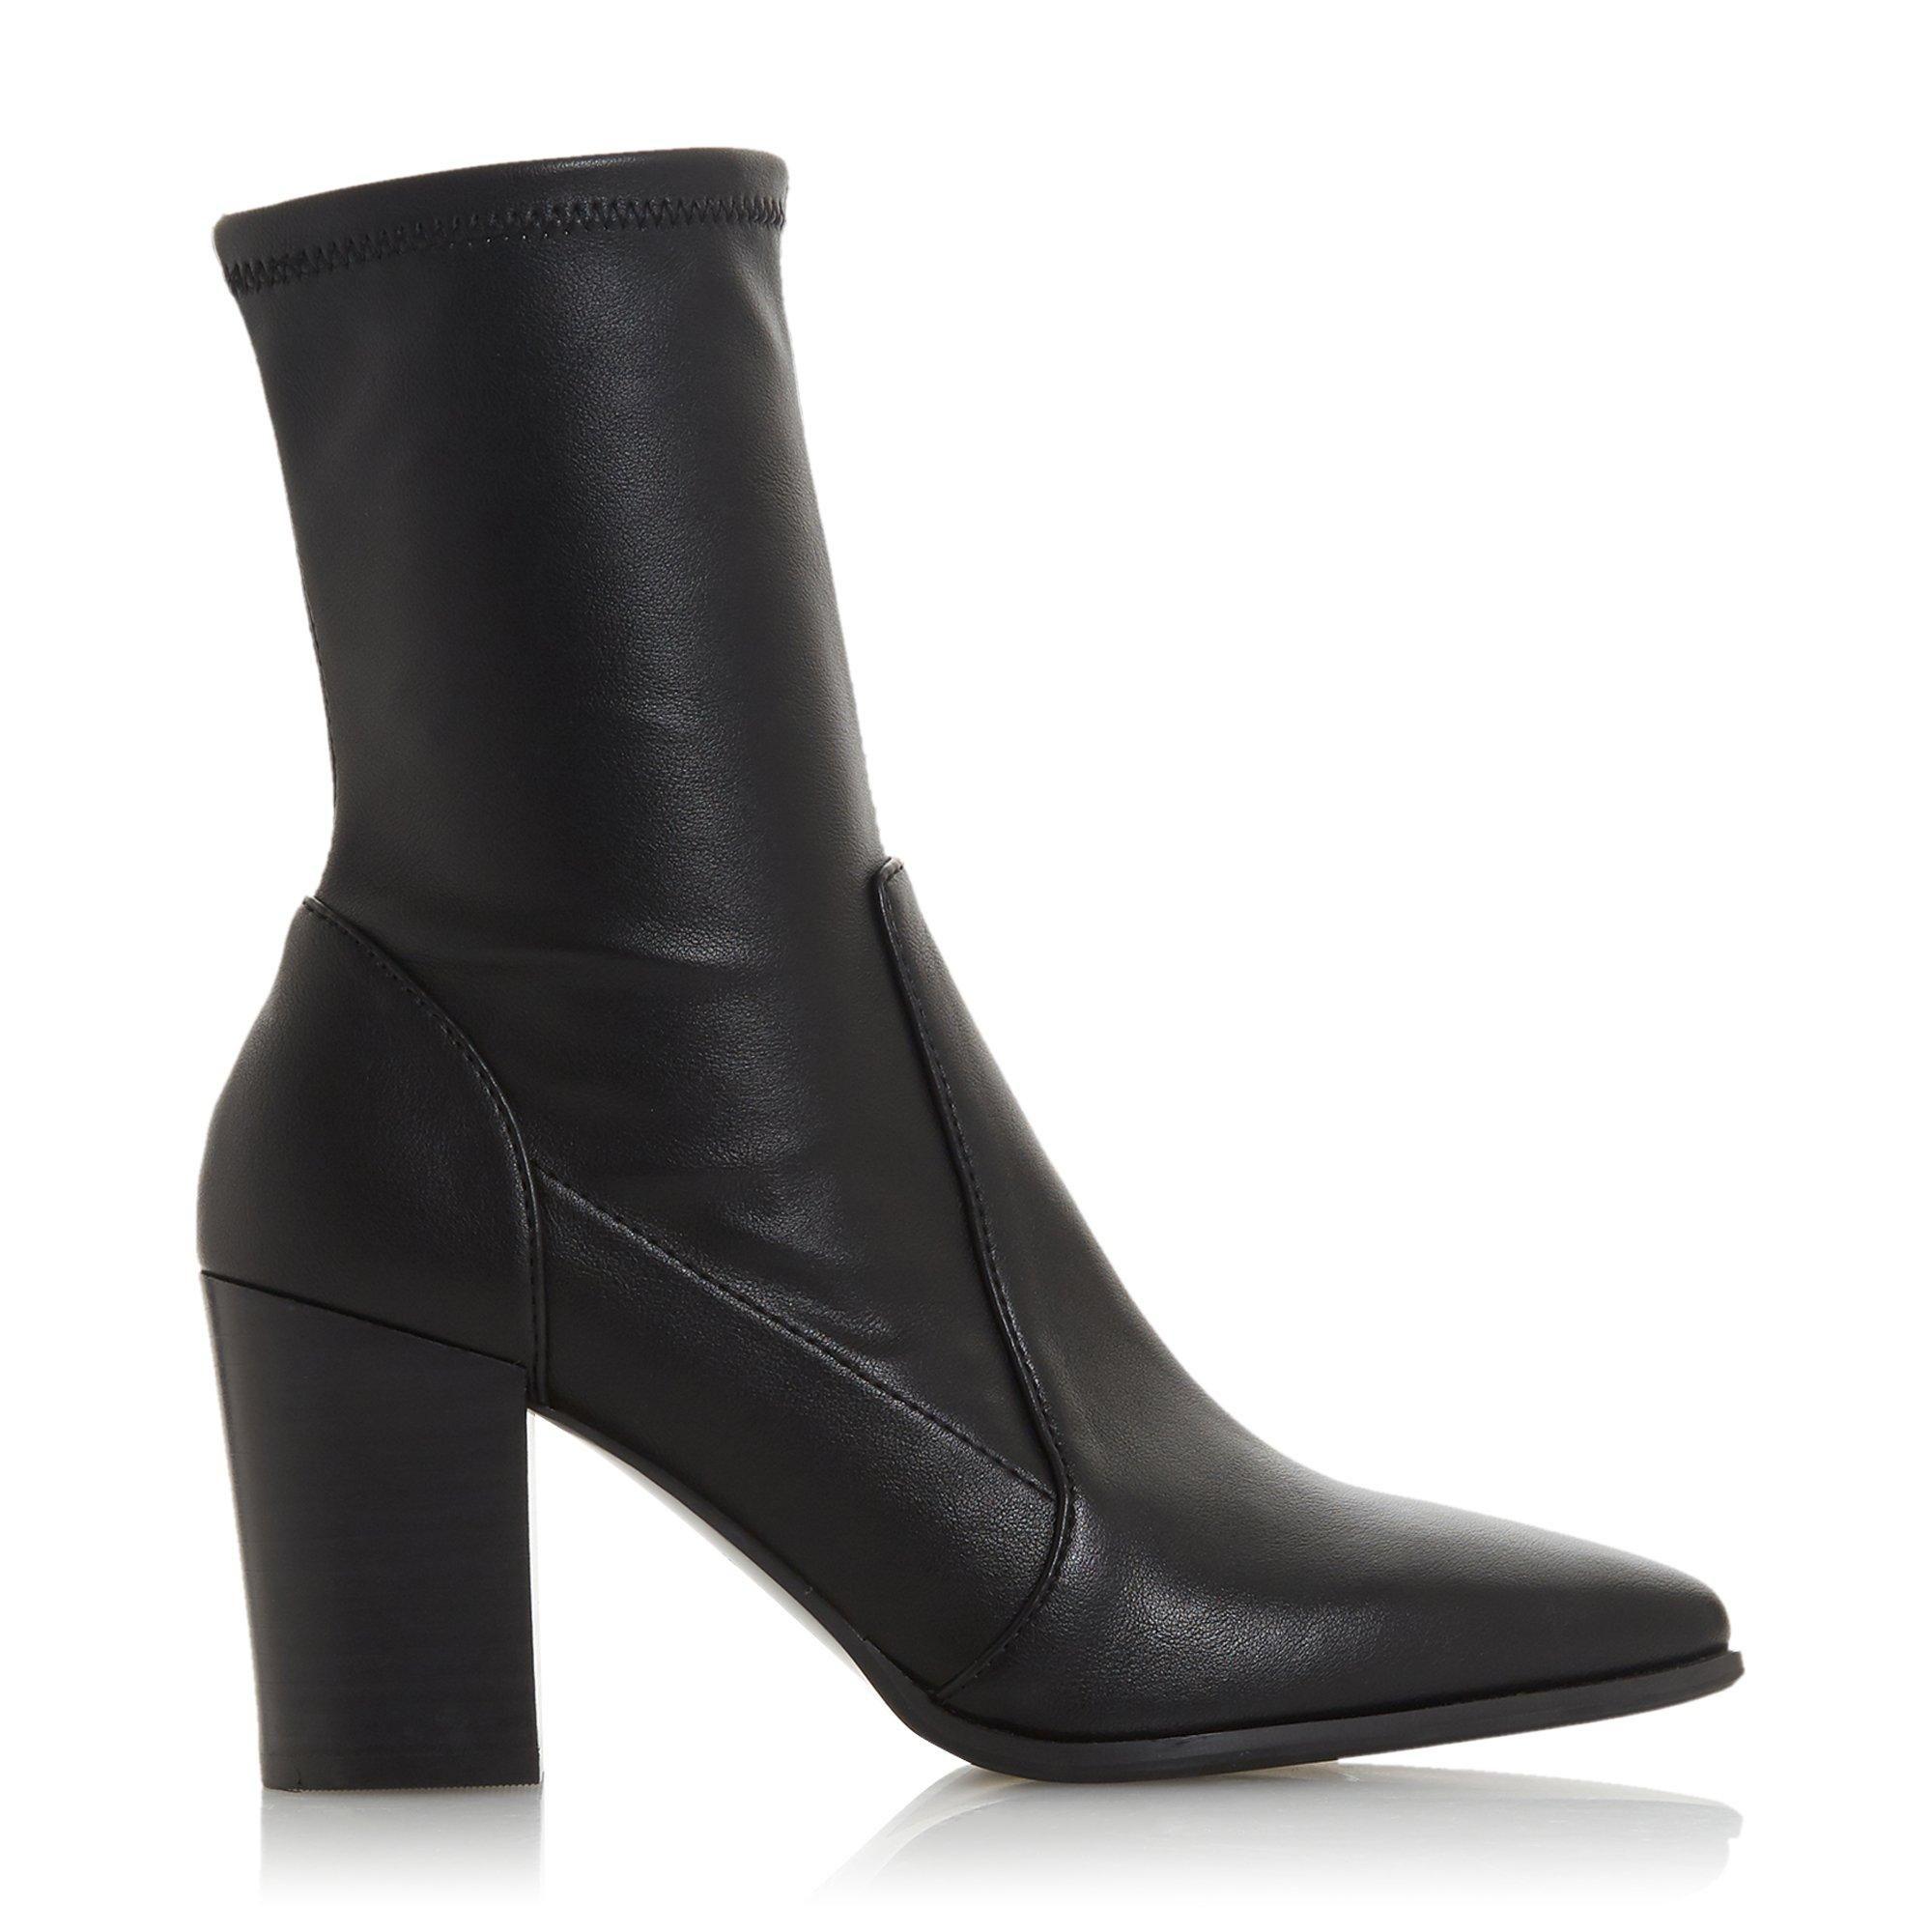 Dune Ladies OSTENE Stretch High Block Heel Ankle Boots